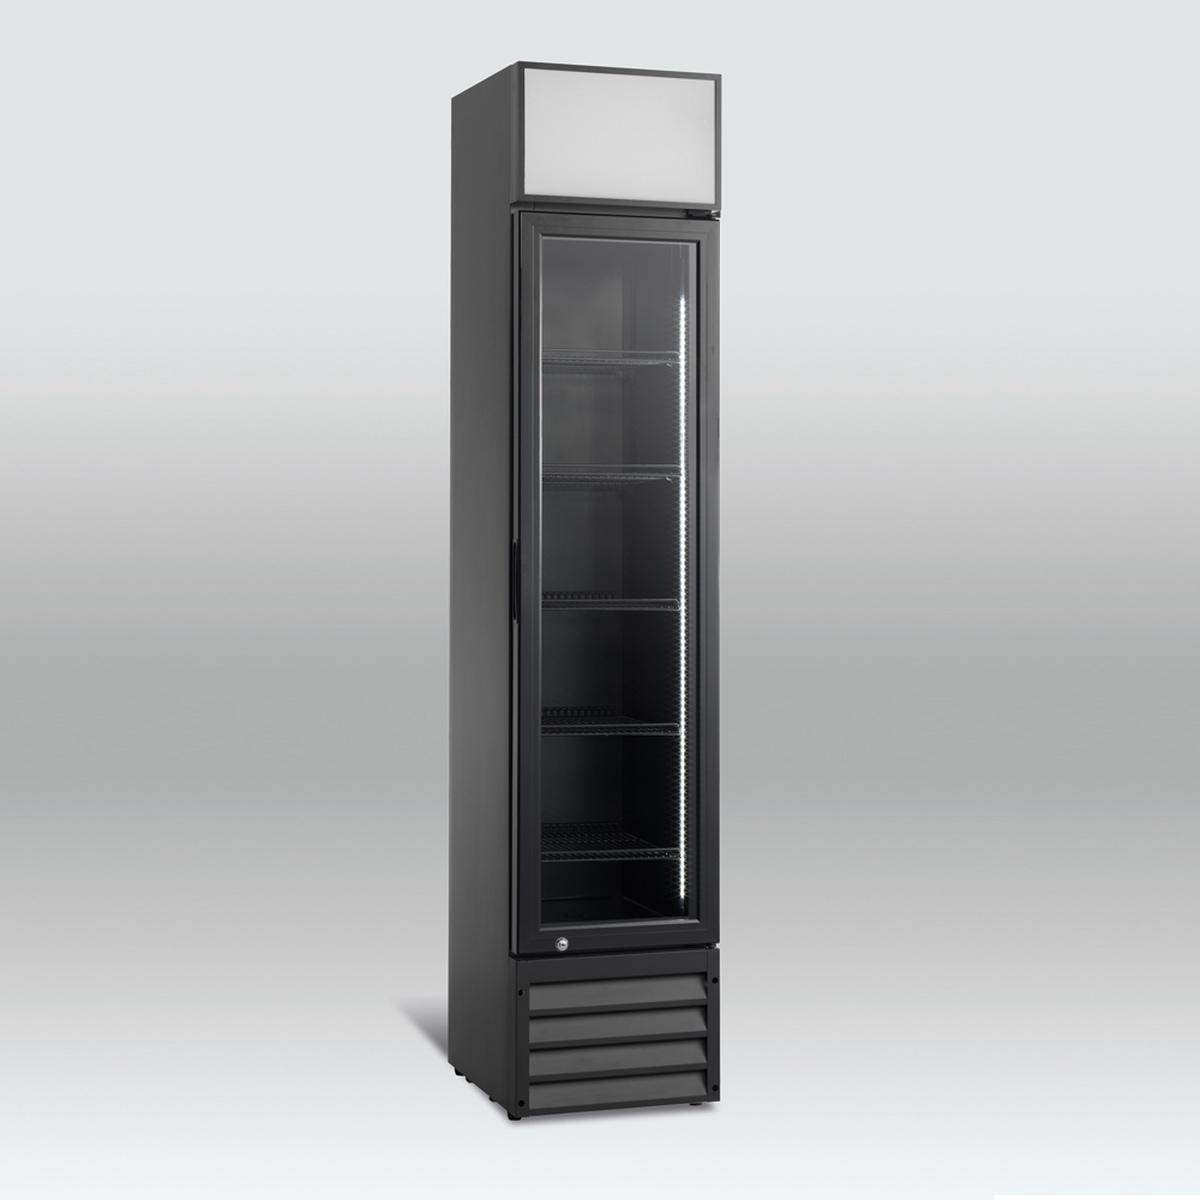 Scandomestic display kjøleskap sort SD 216-1B